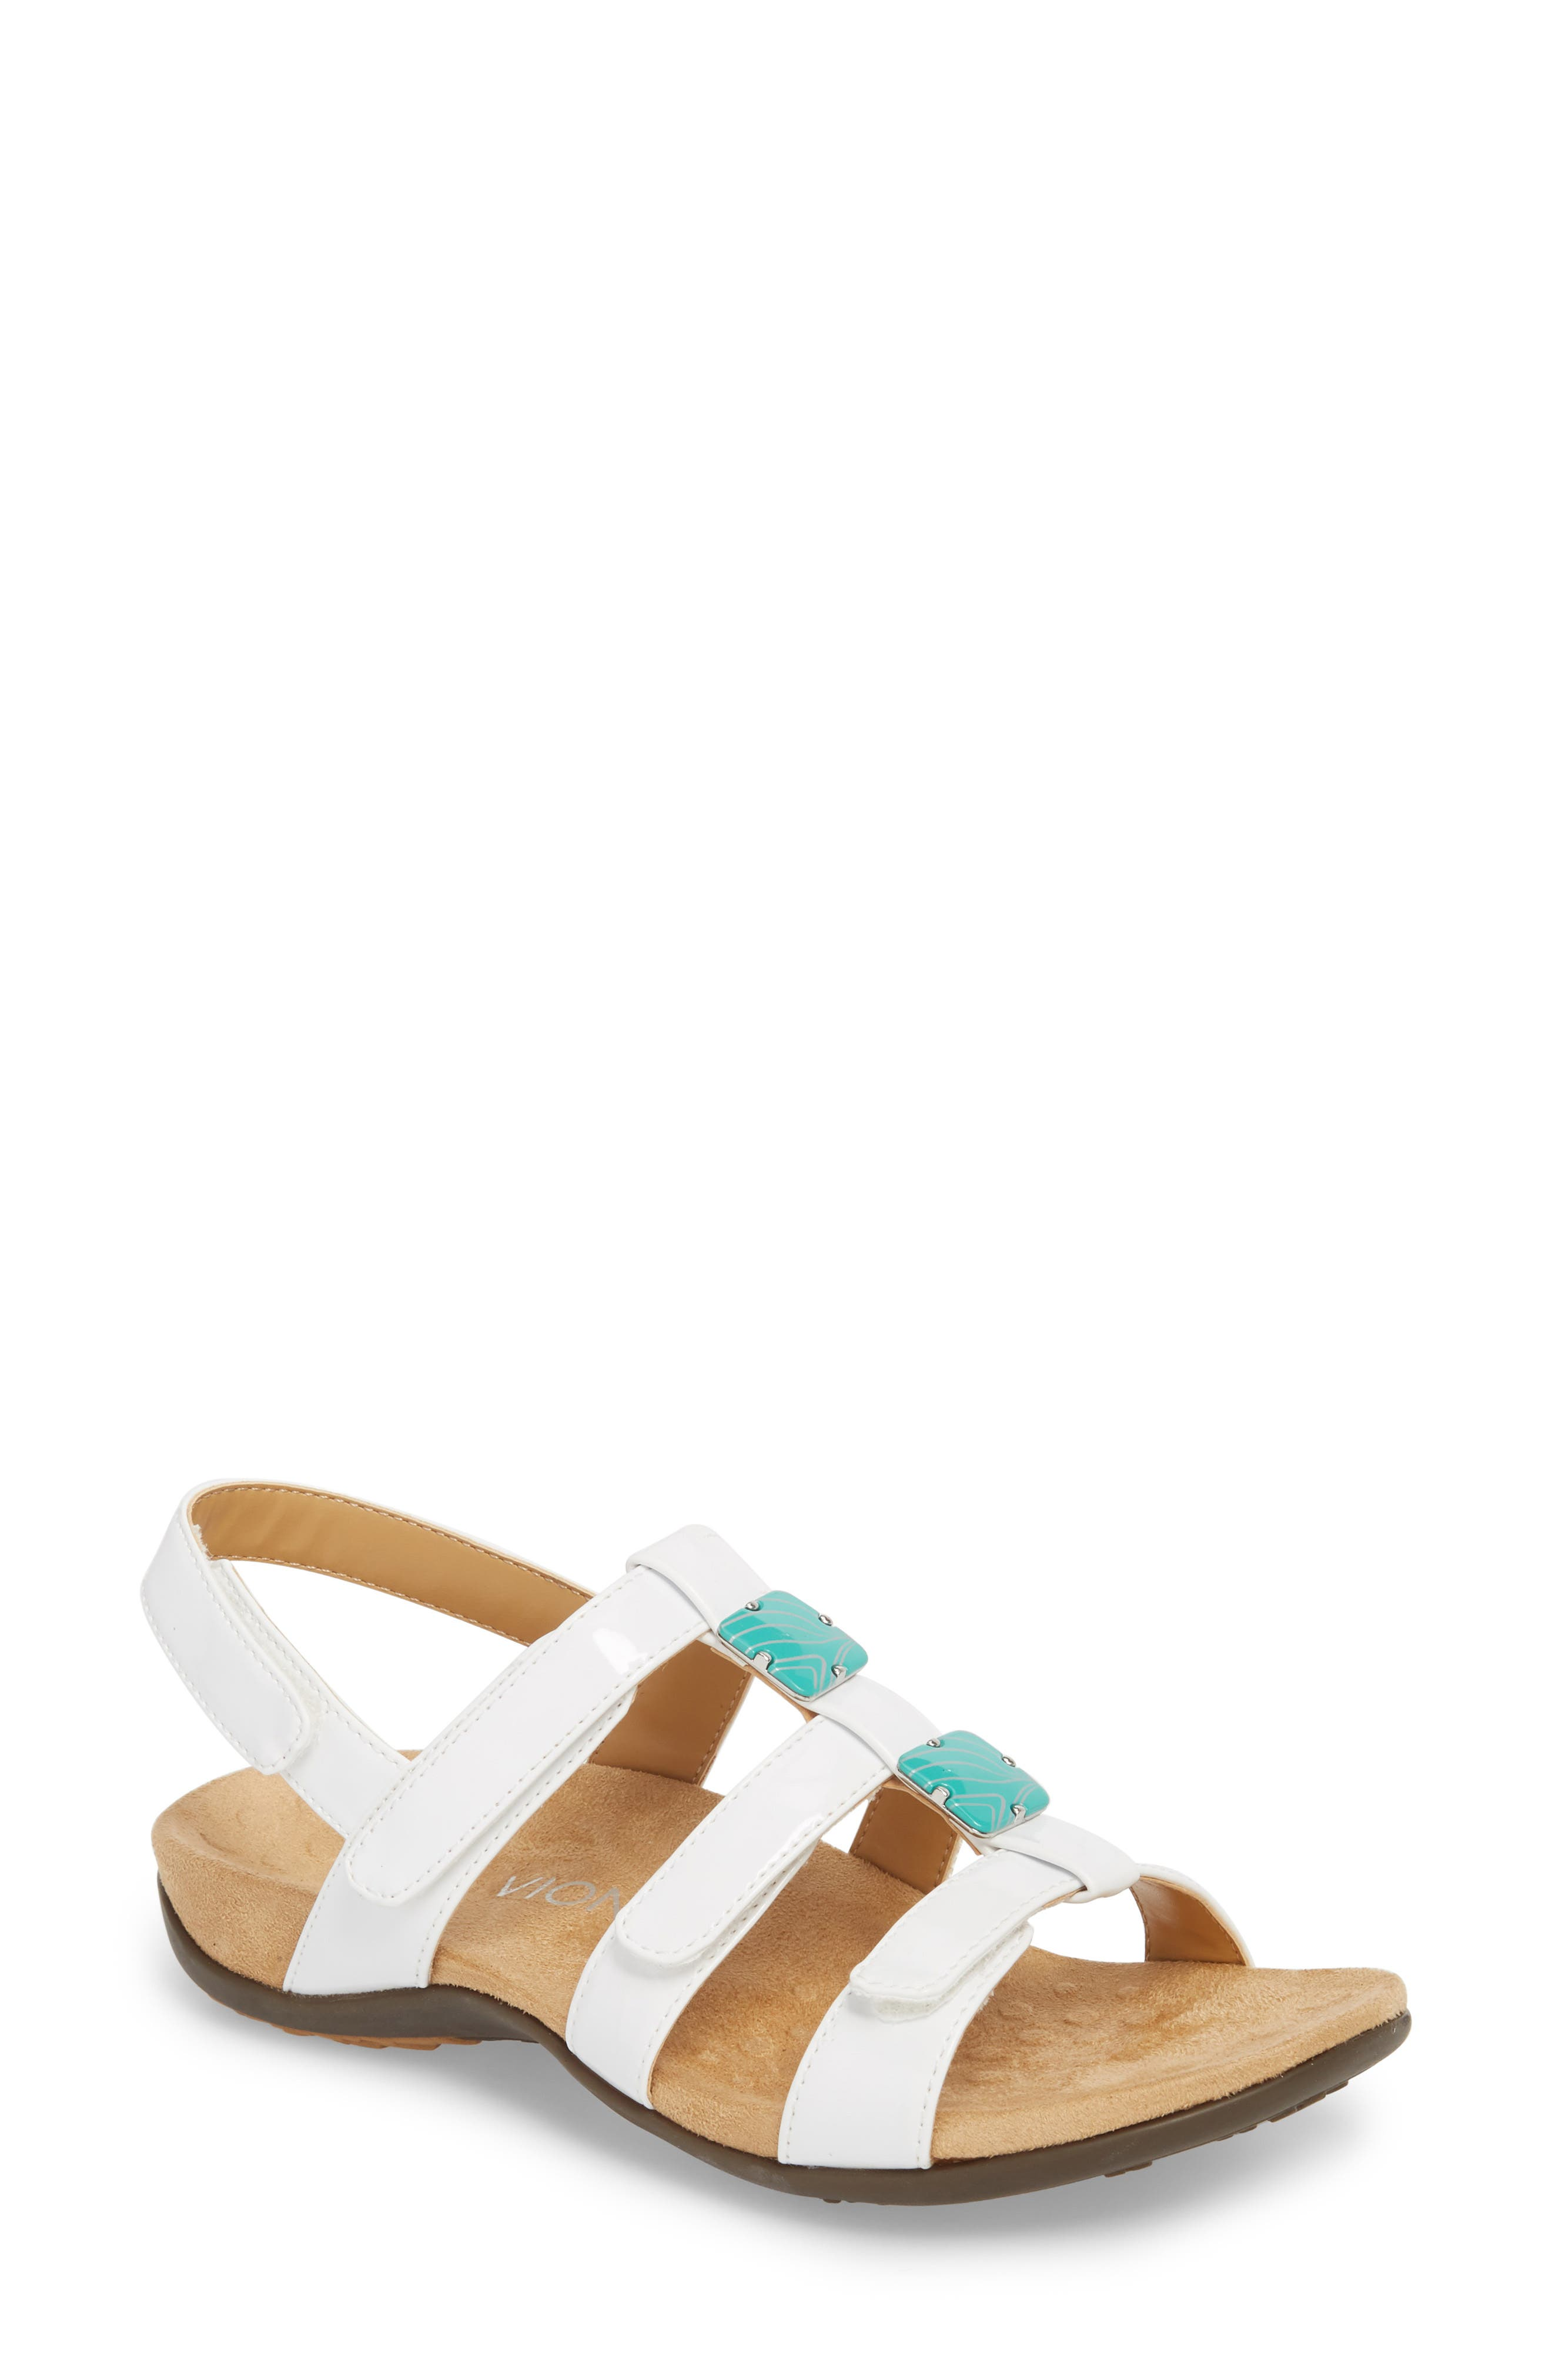 Vionic 'Amber with Orthaheel® Technology' Adjustable Sandal